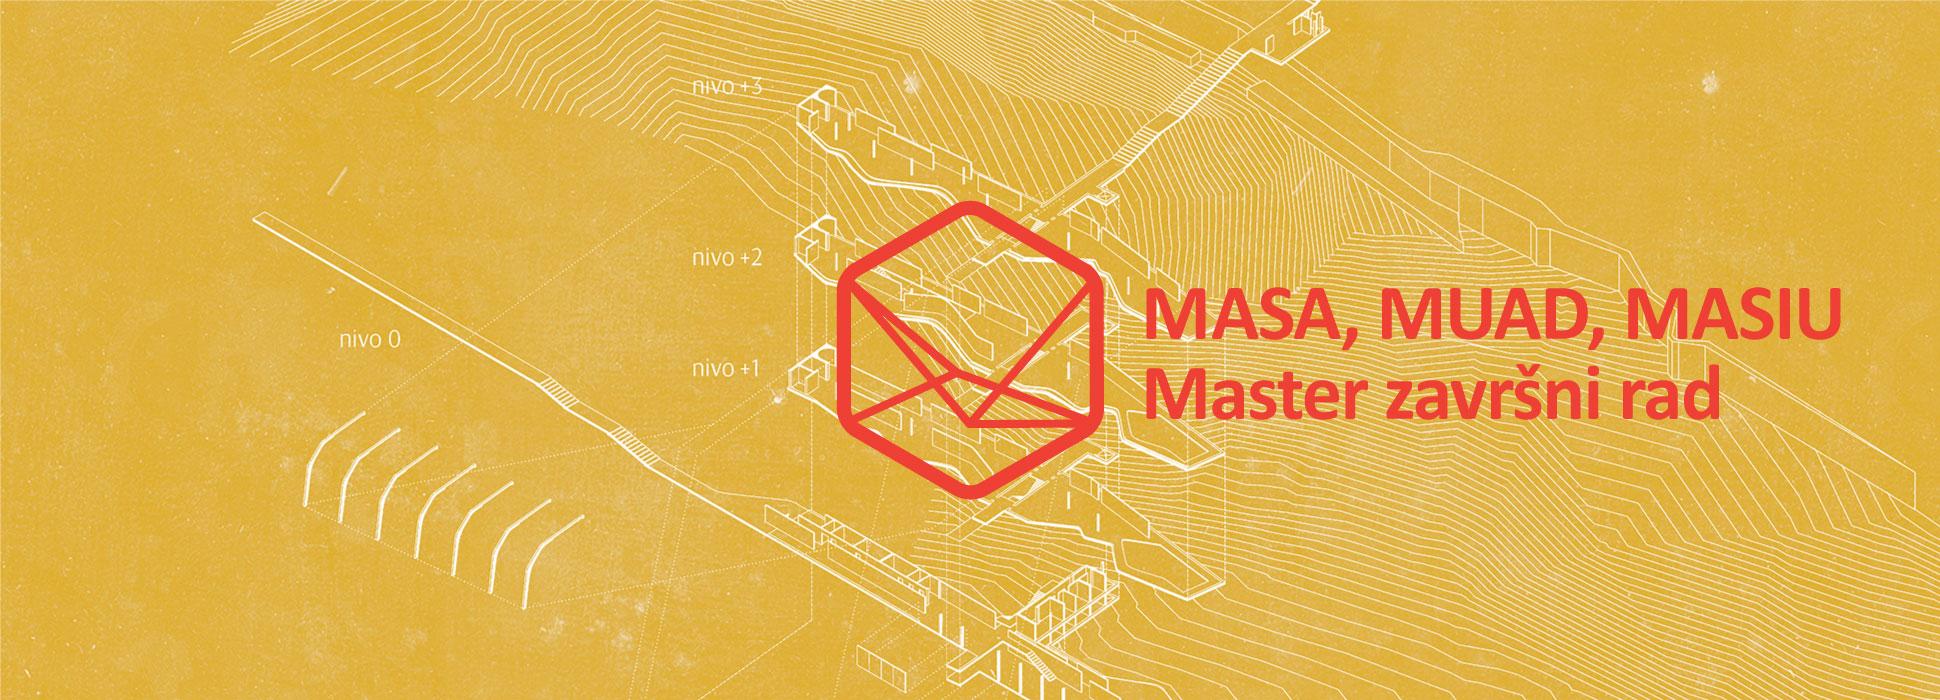 201617_MASA-MUAD-MASIU_Master-zavrsni-rad_cover